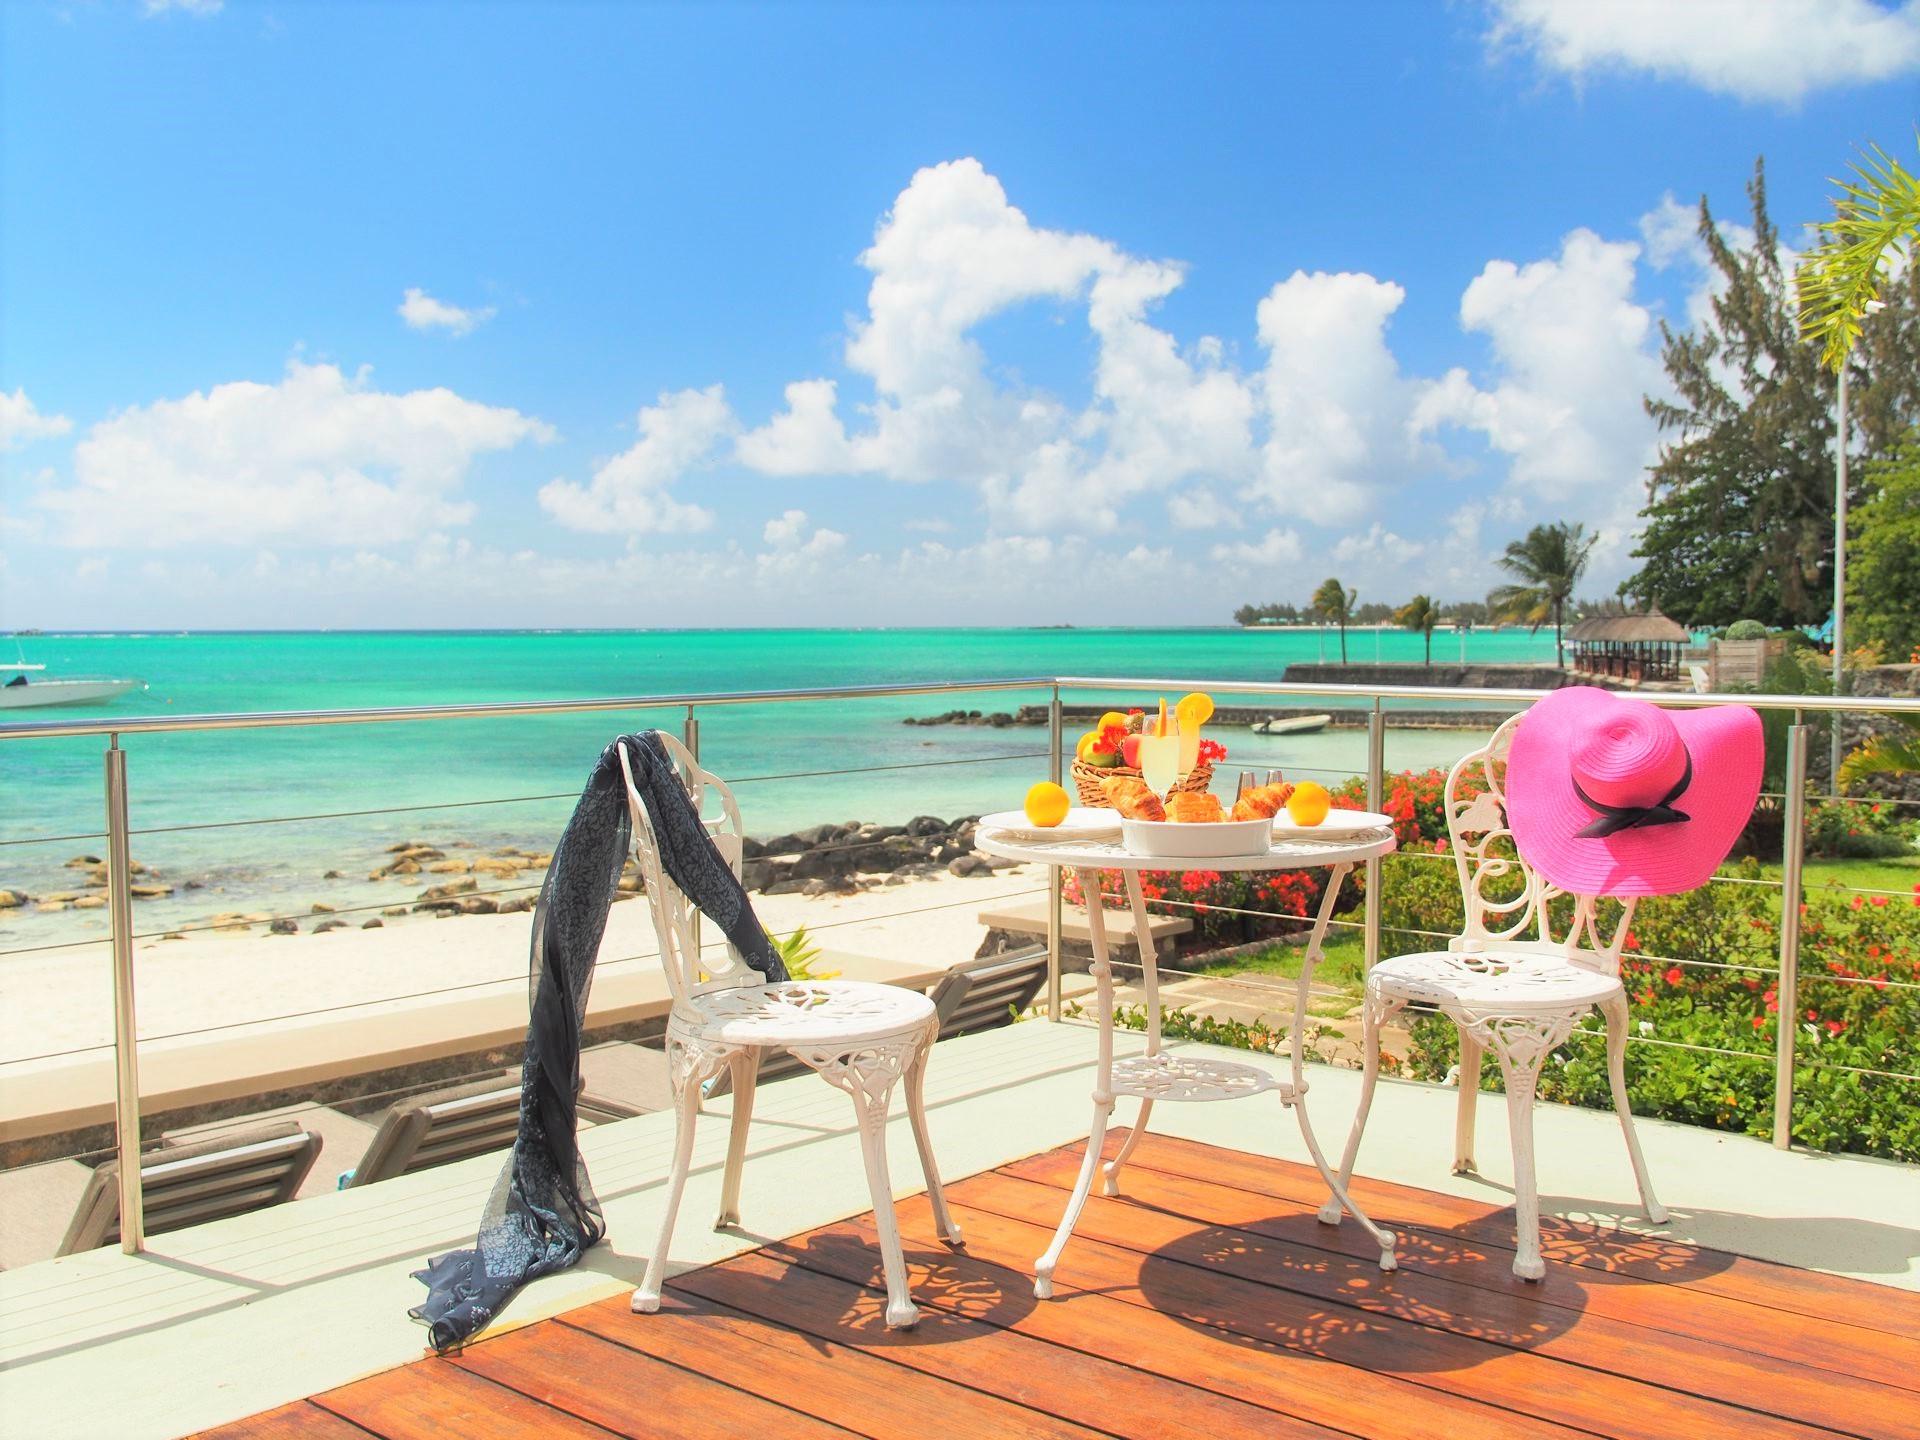 Le-Cerisier-Property-Mauritius-Immobilier-1.jpg